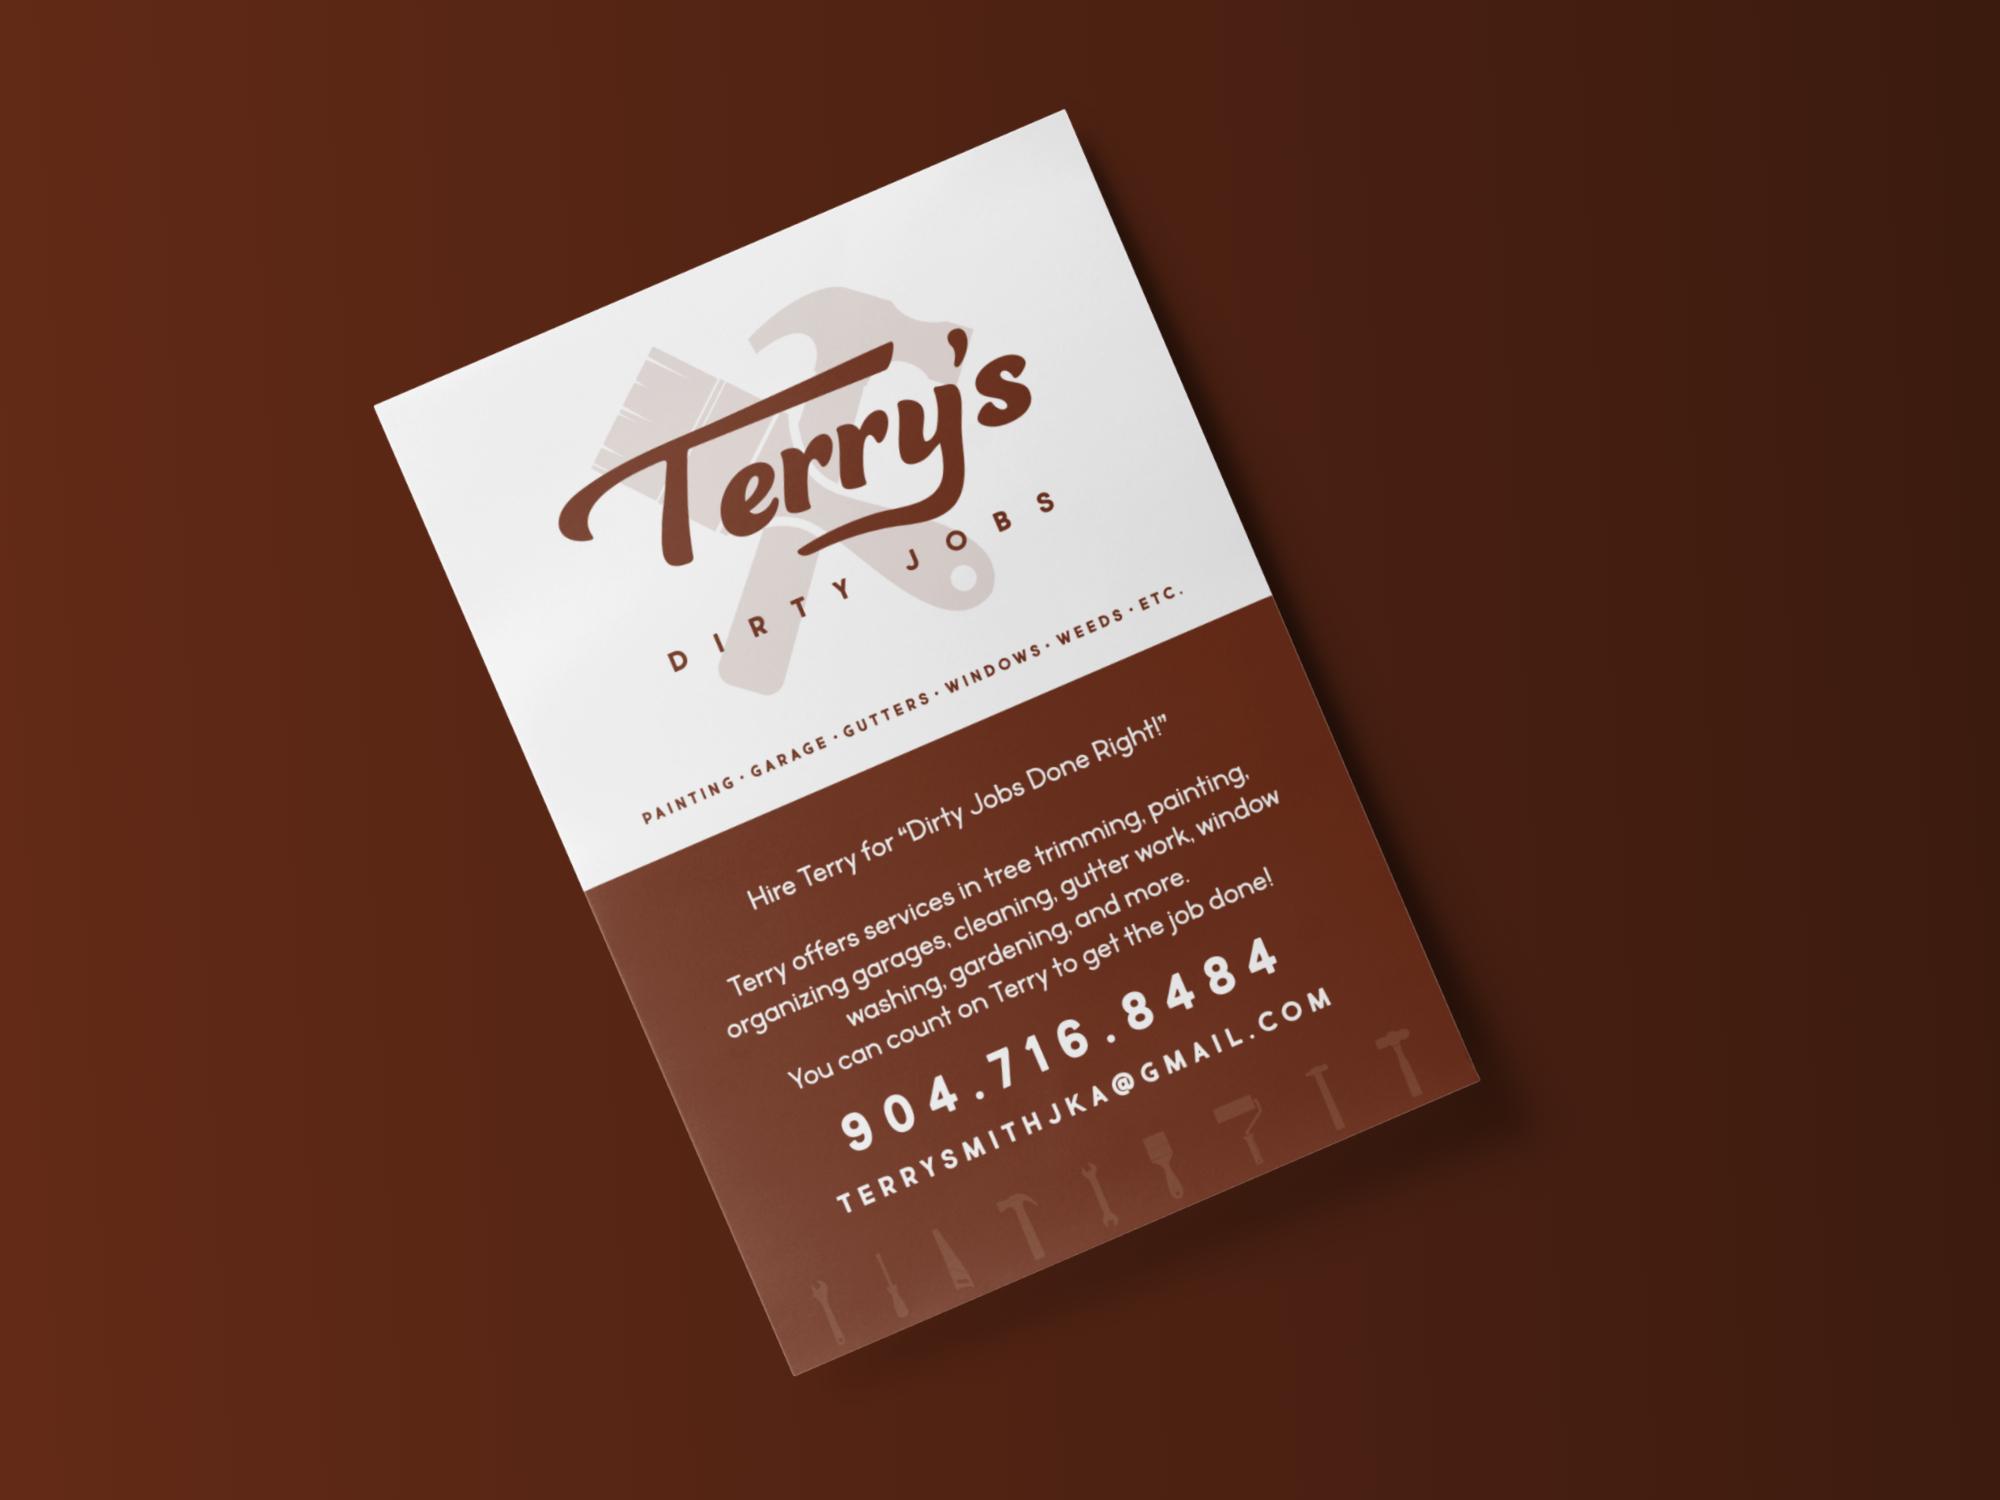 terry's-dirty-jobs-flyer (1).jpeg